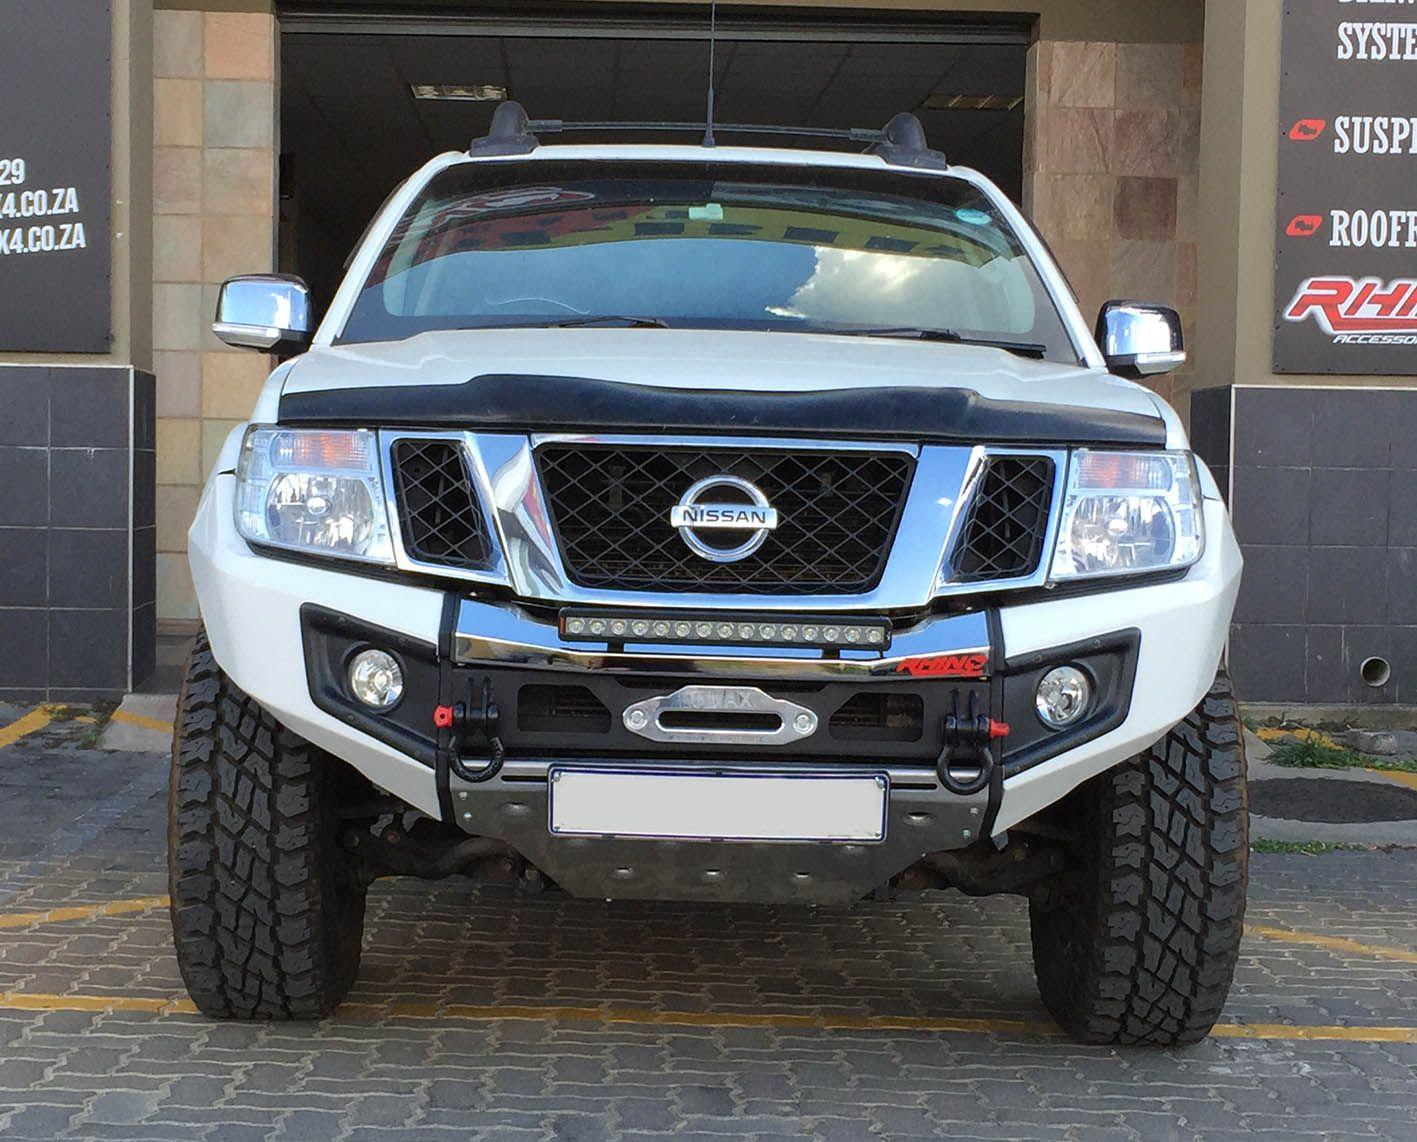 Rhino 4 215 4 Nissan Navara Front Evolution Bumper Trucks